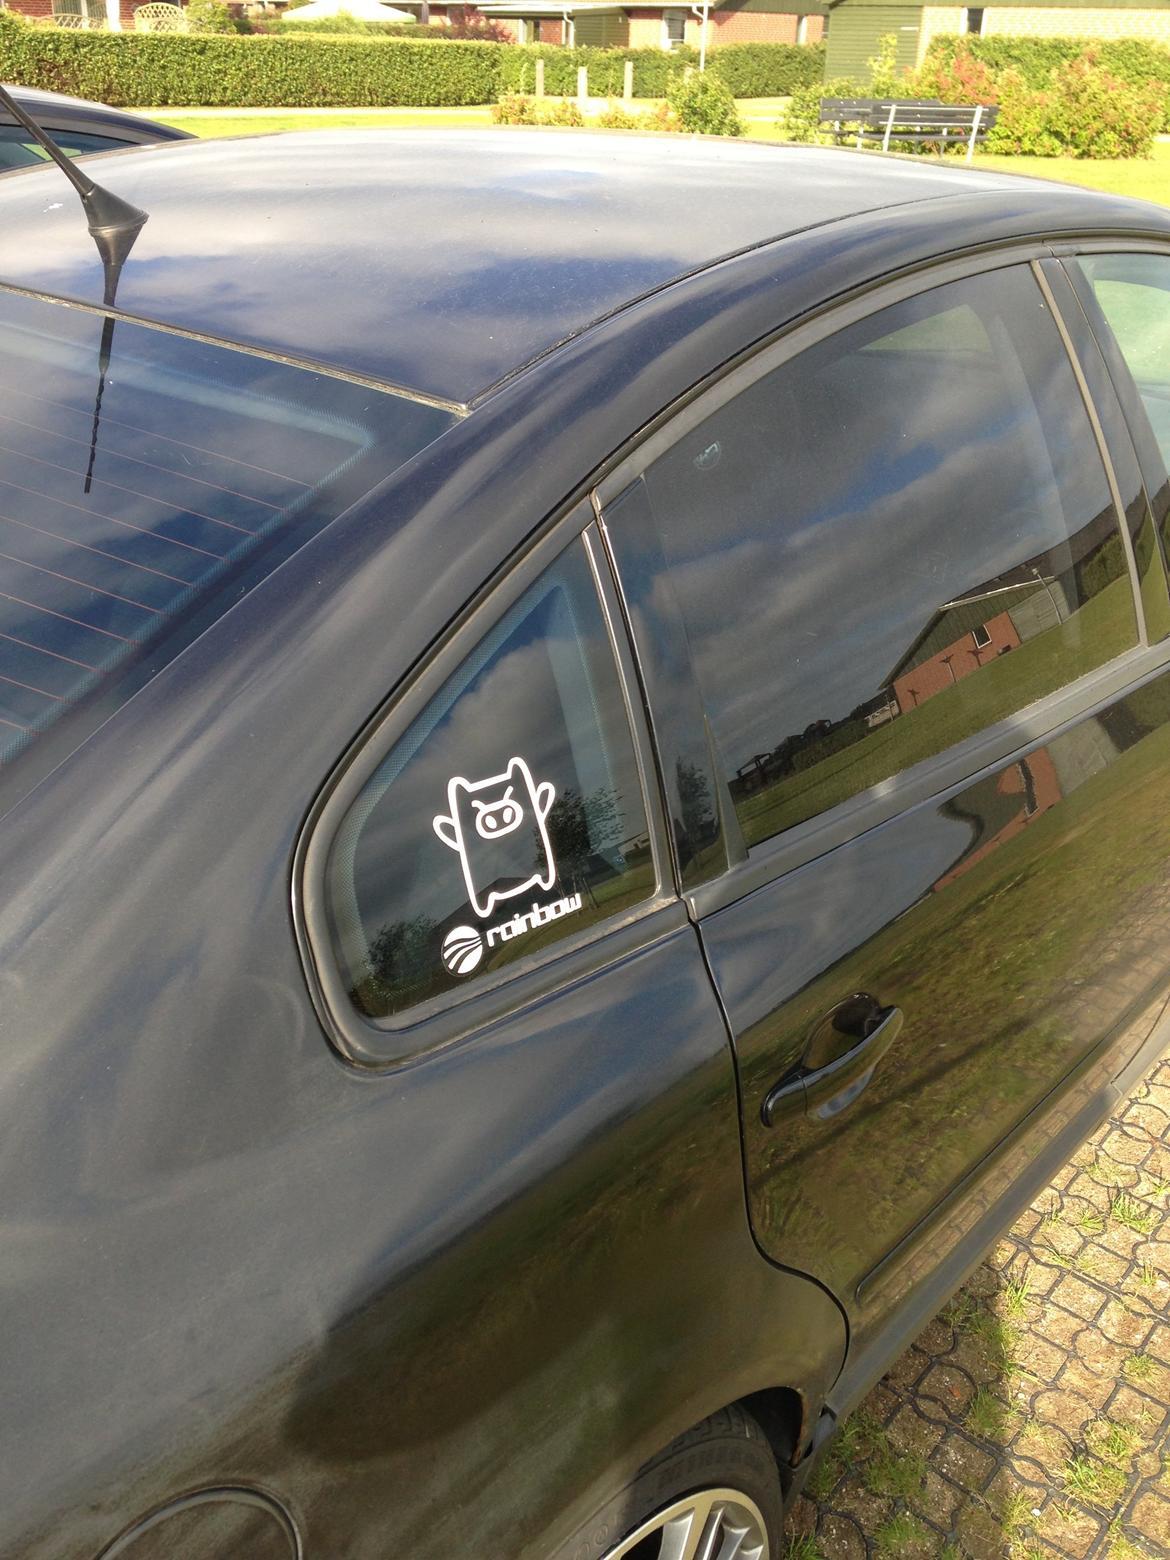 VW Passat 3B Limo turbo billede 12